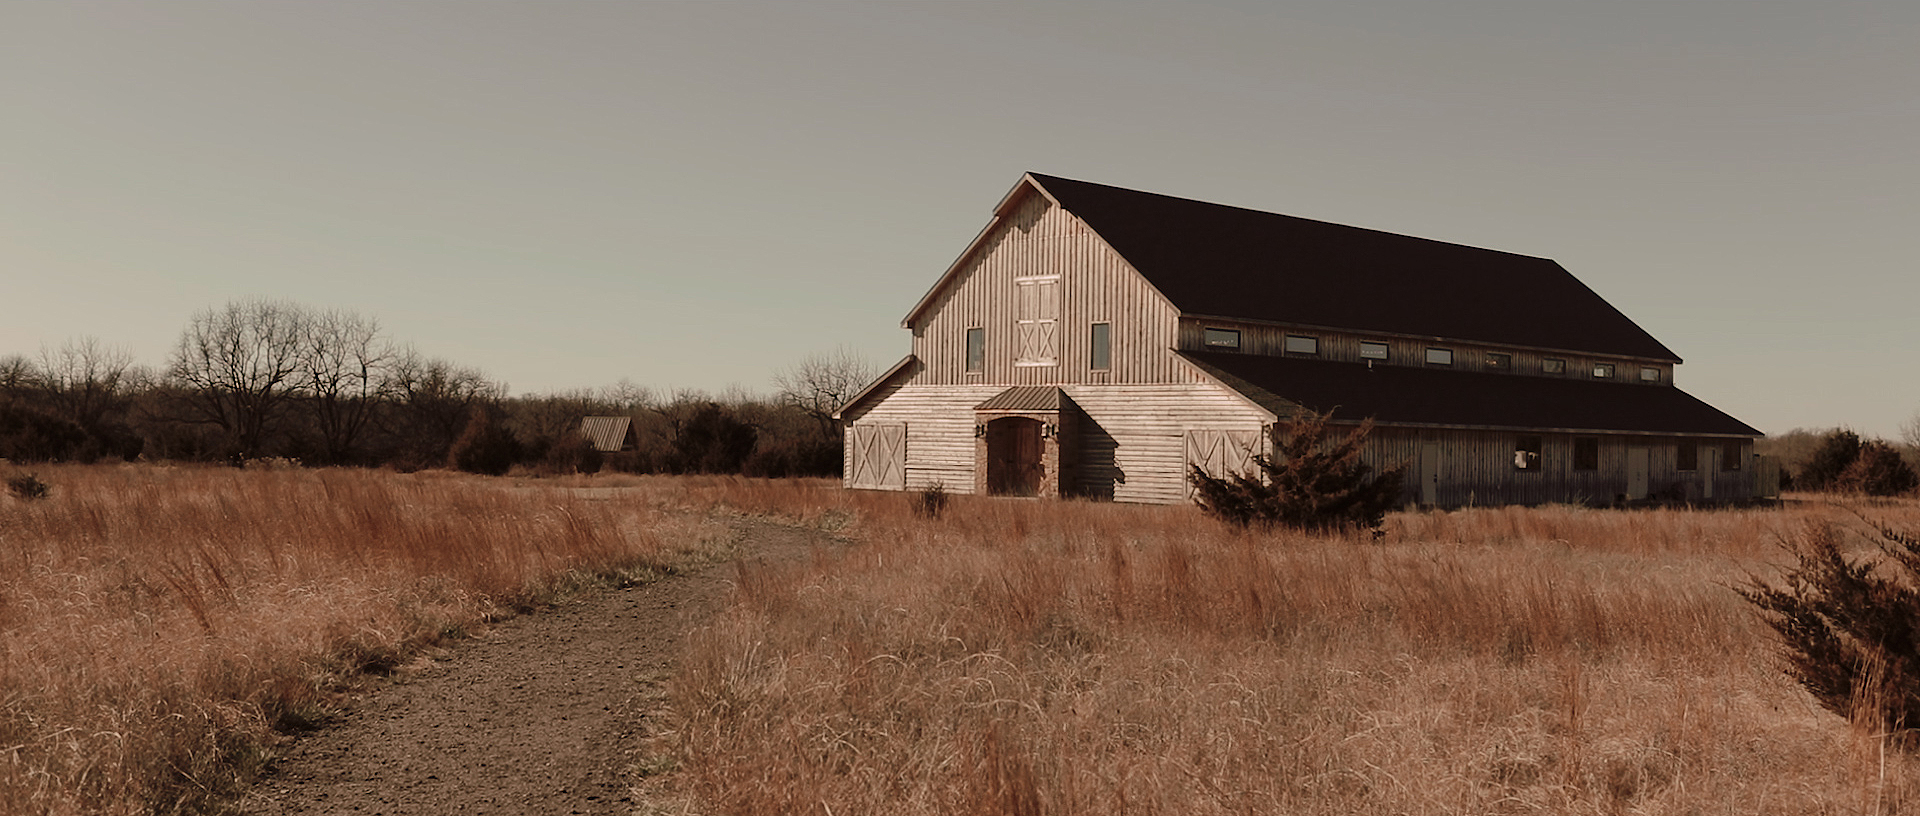 stone-hill-barn-august